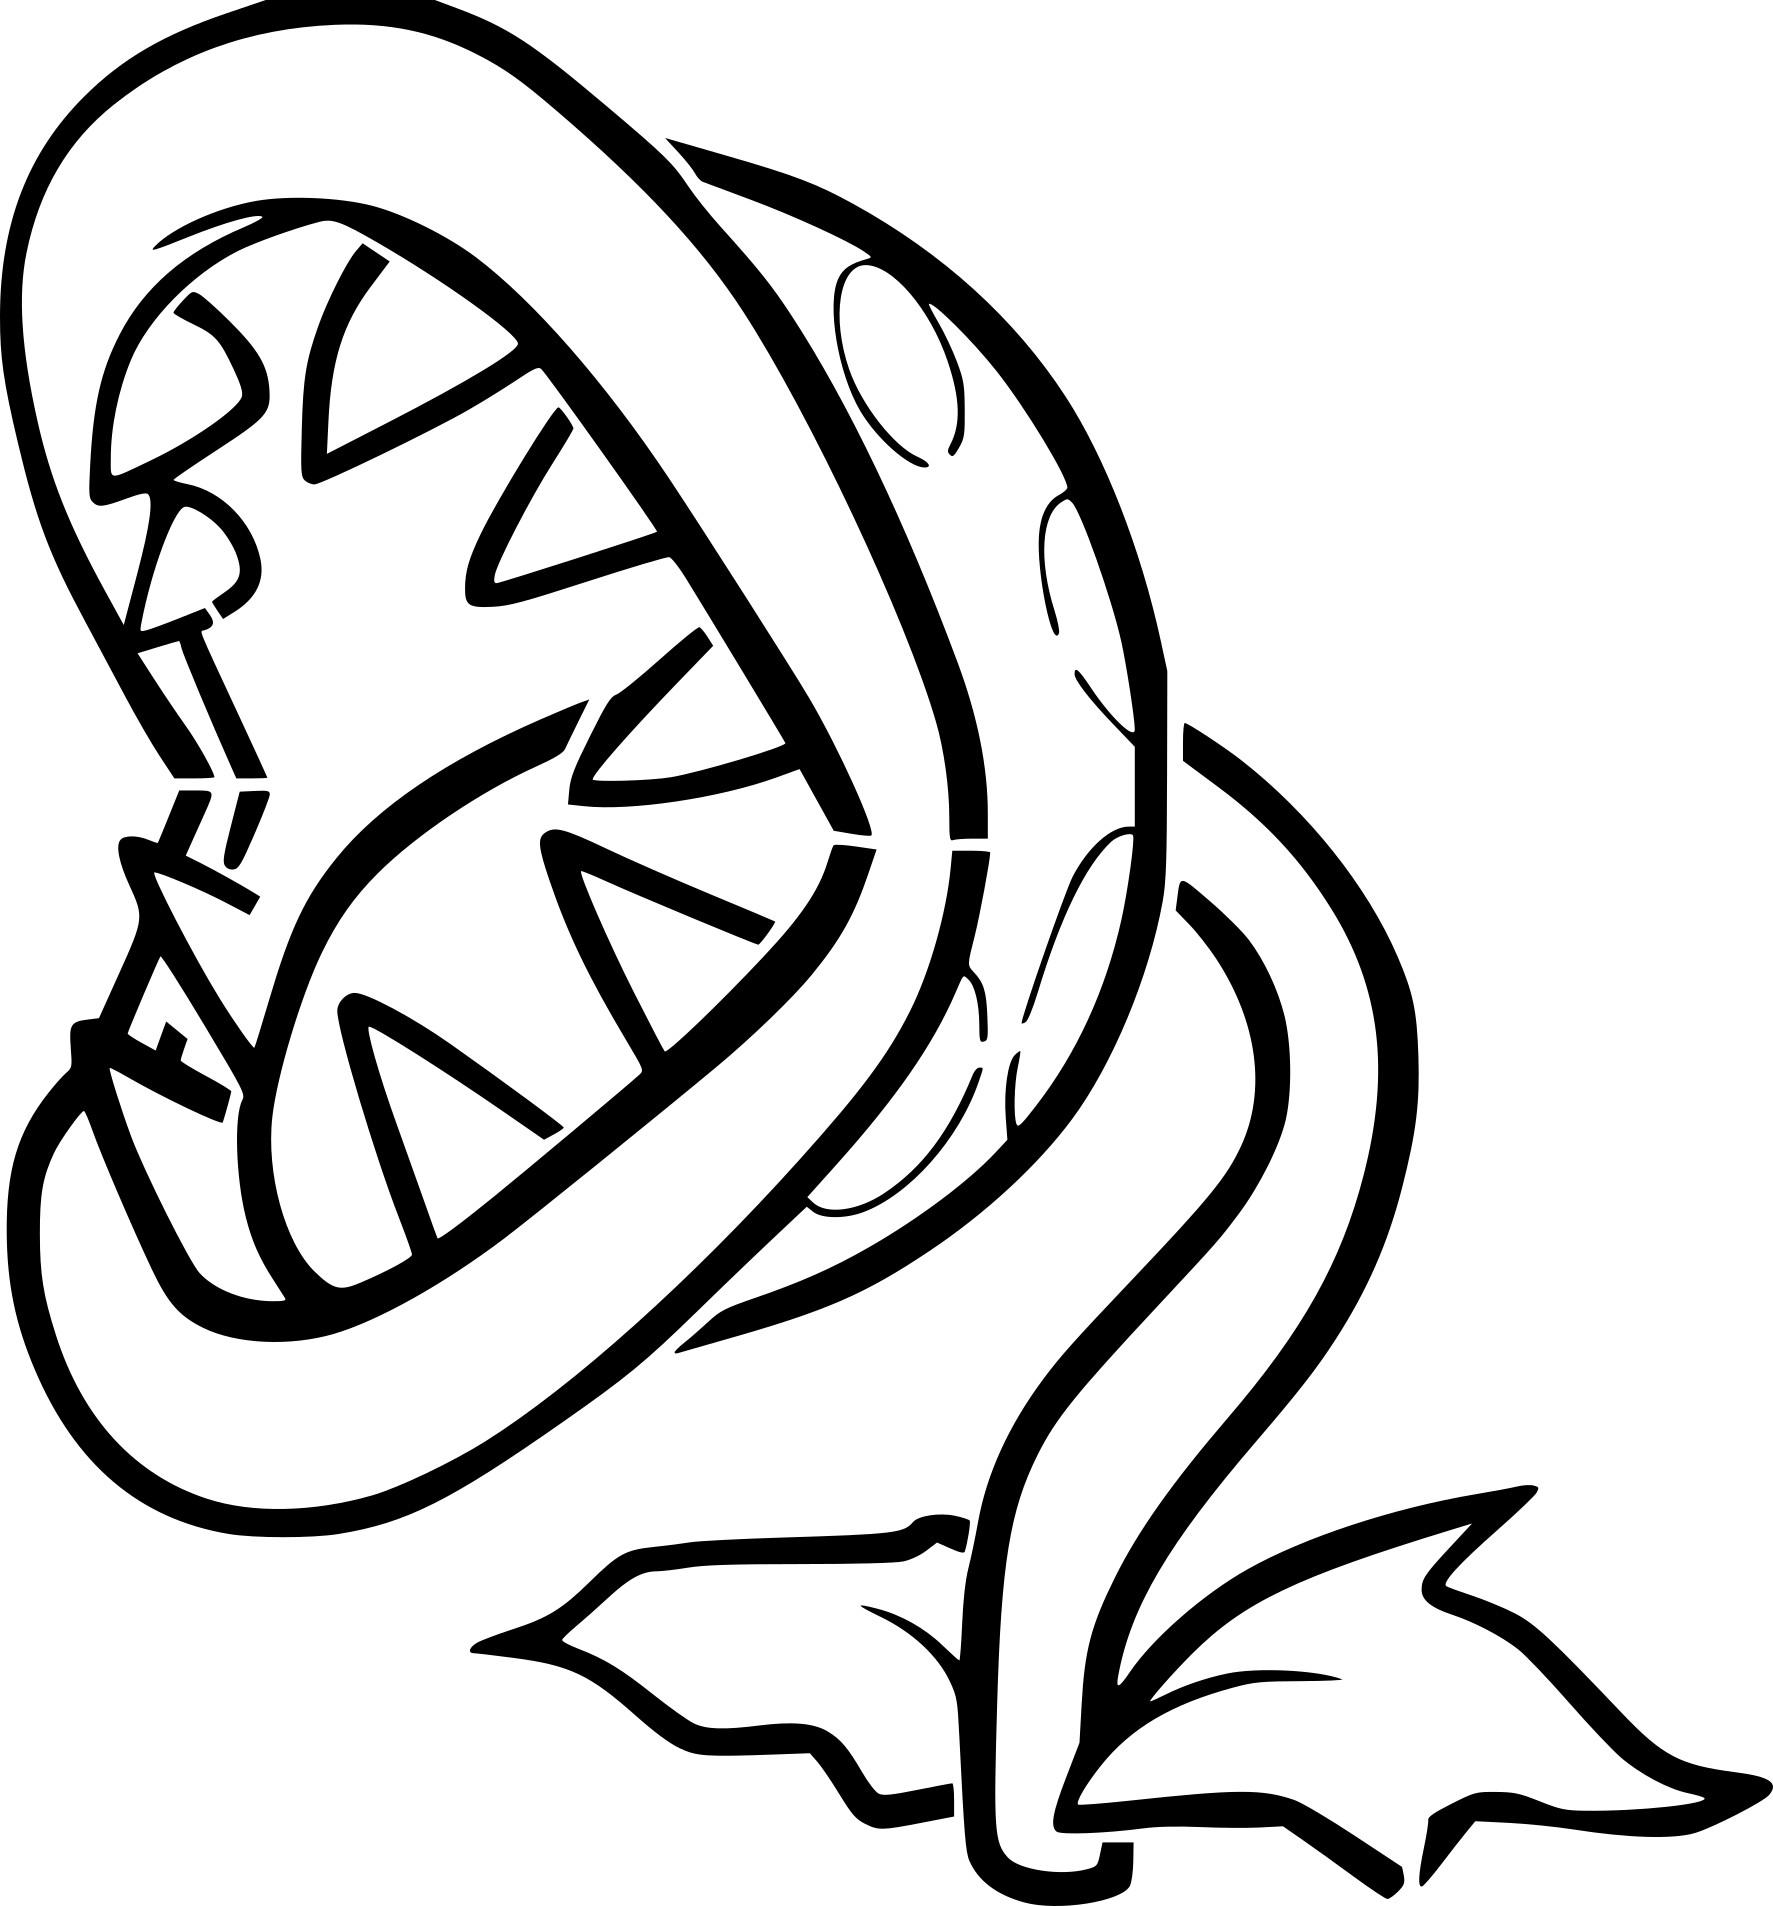 Plante carnivore mario dessin - Plante carnivore mario ...